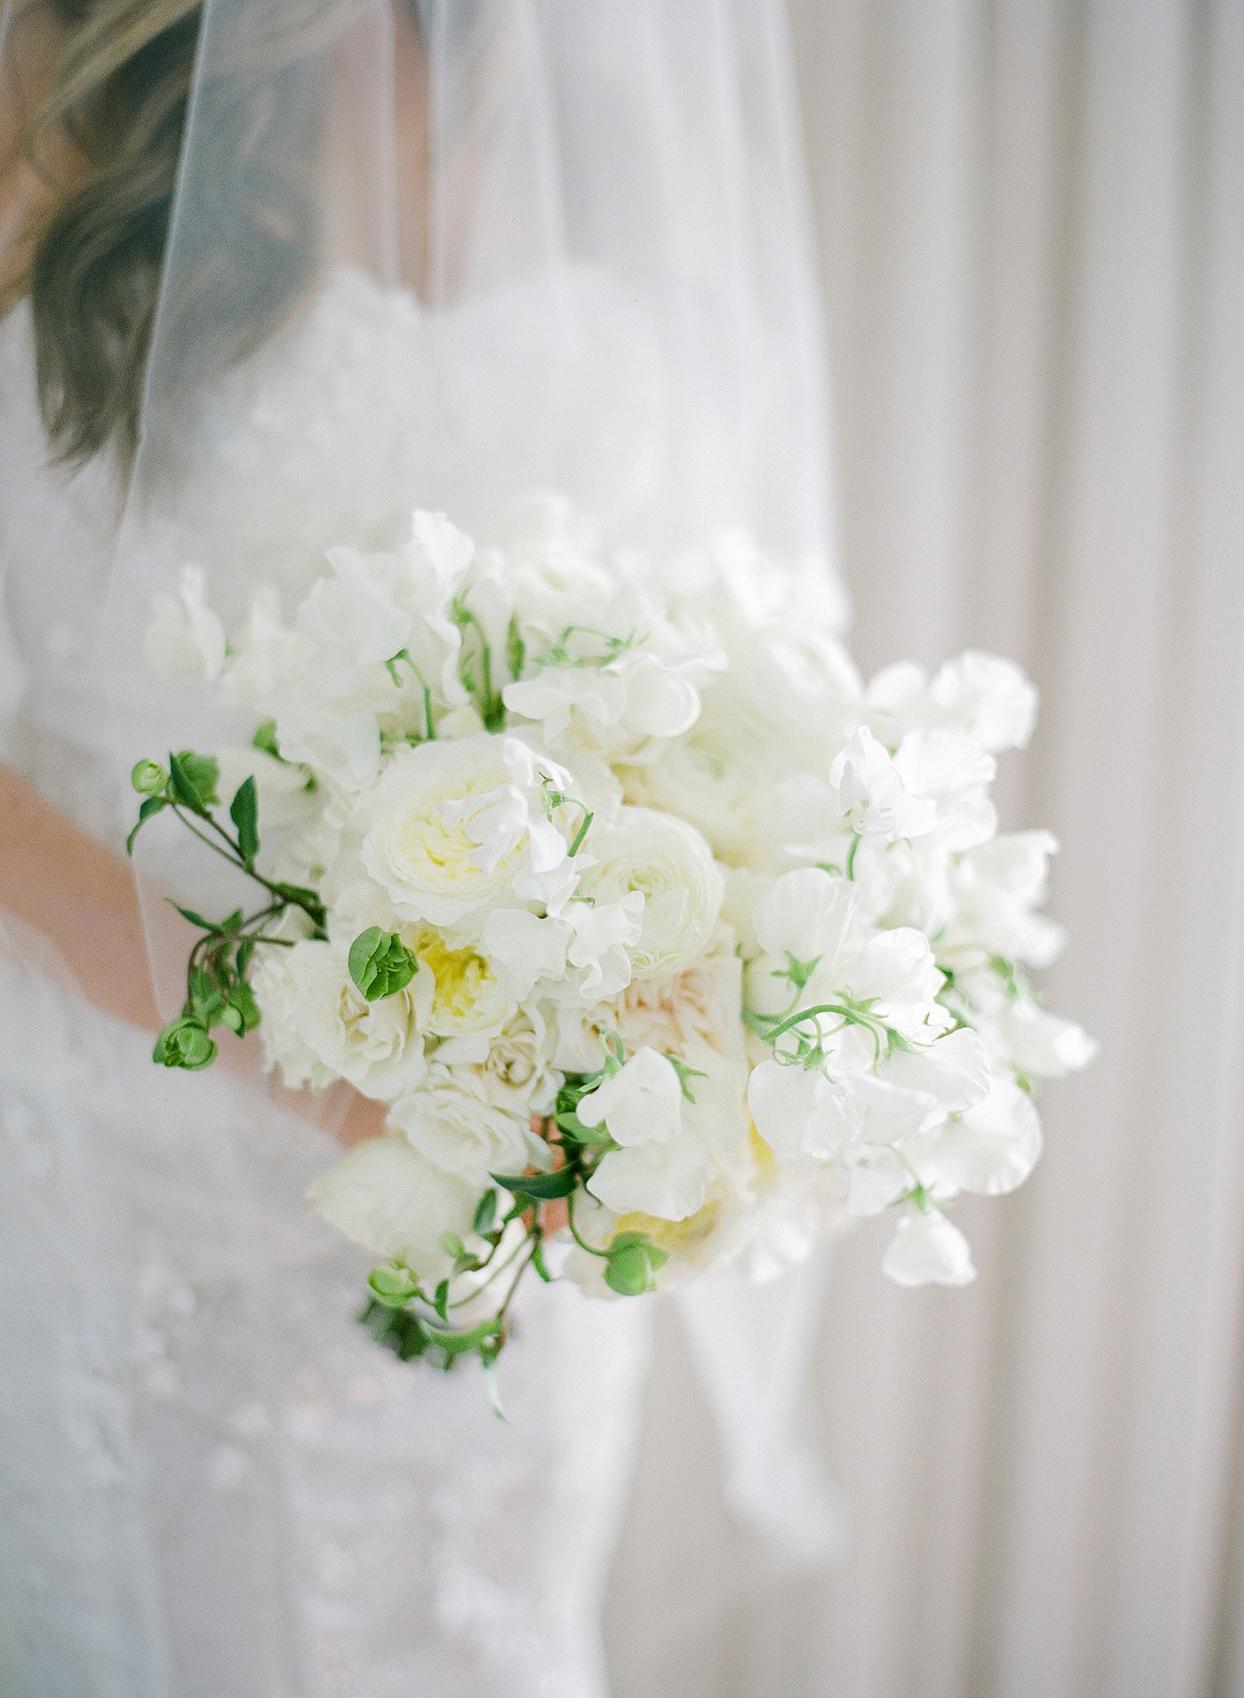 brittany brian wedding bride's white floral bouquet in her hands